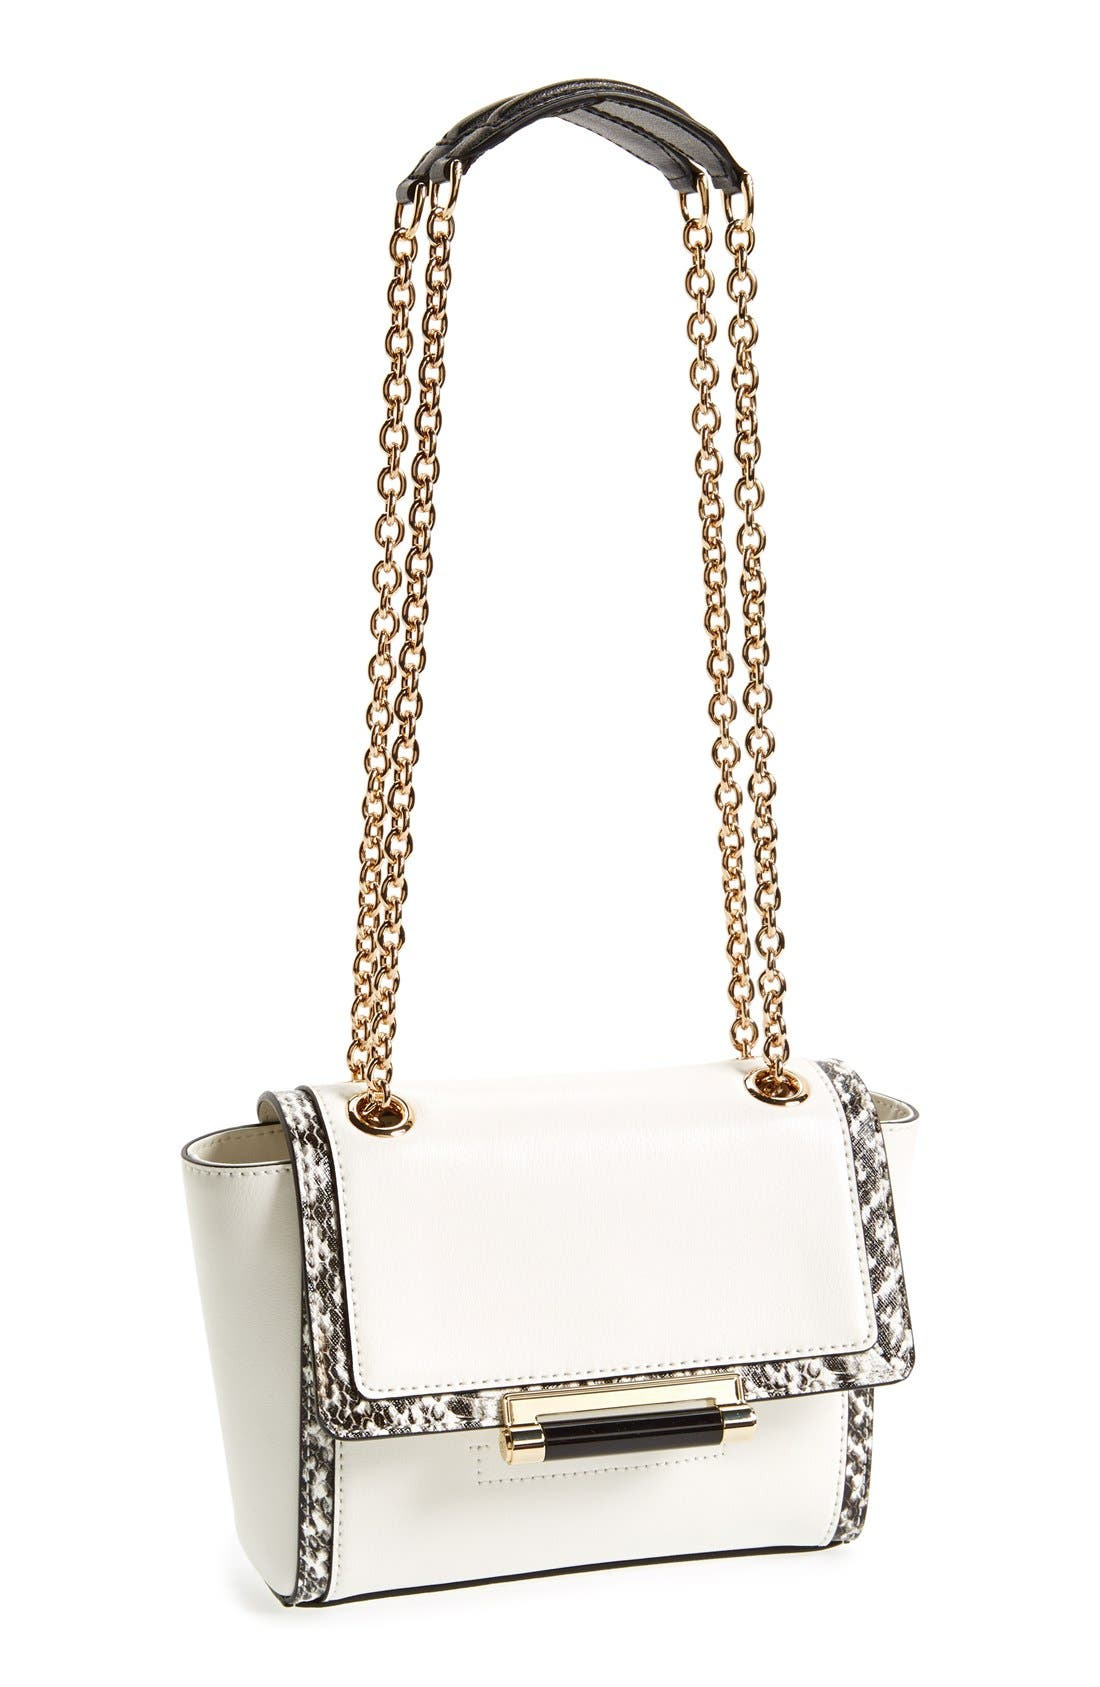 Alternate Image 1 Selected - Diane Von Furstenberg '440 - Mini' Leather Crossbody Bag